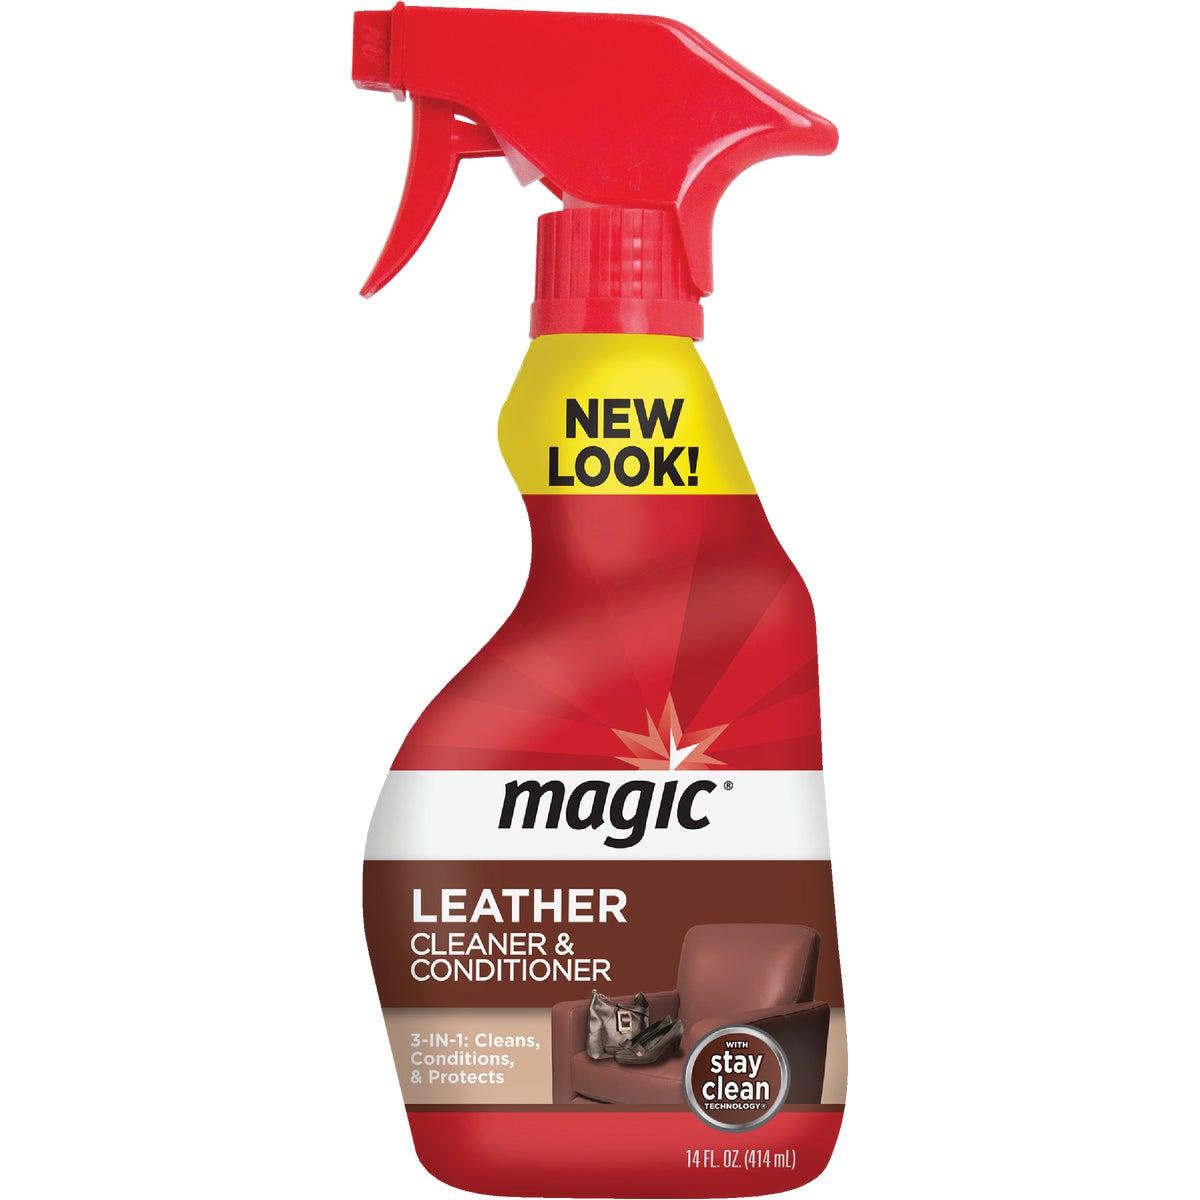 Magic Leather Cleaner & Conditioner, 3068